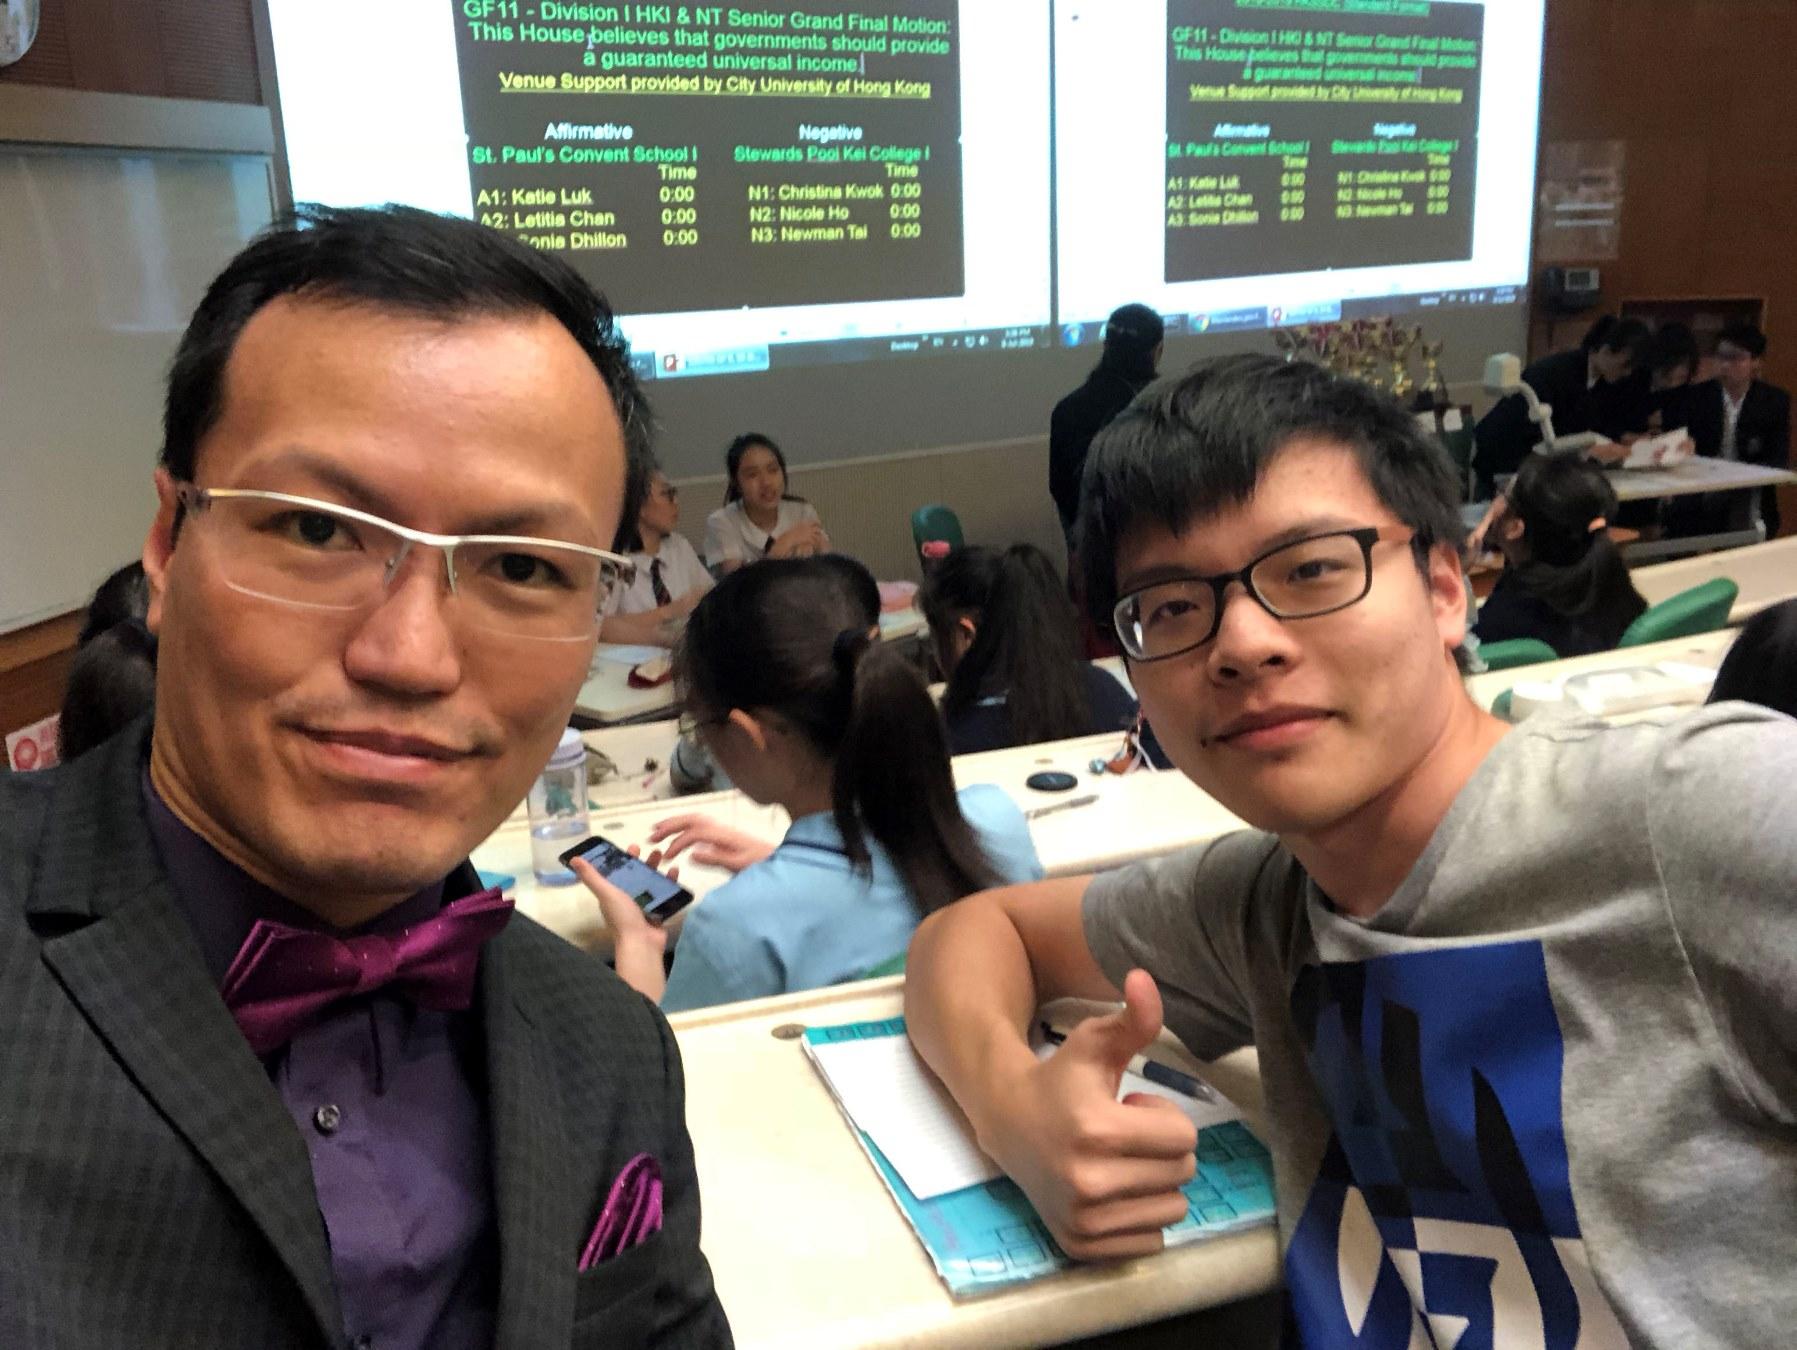 http://npc.edu.hk/sites/default/files/a_support_2.jpg